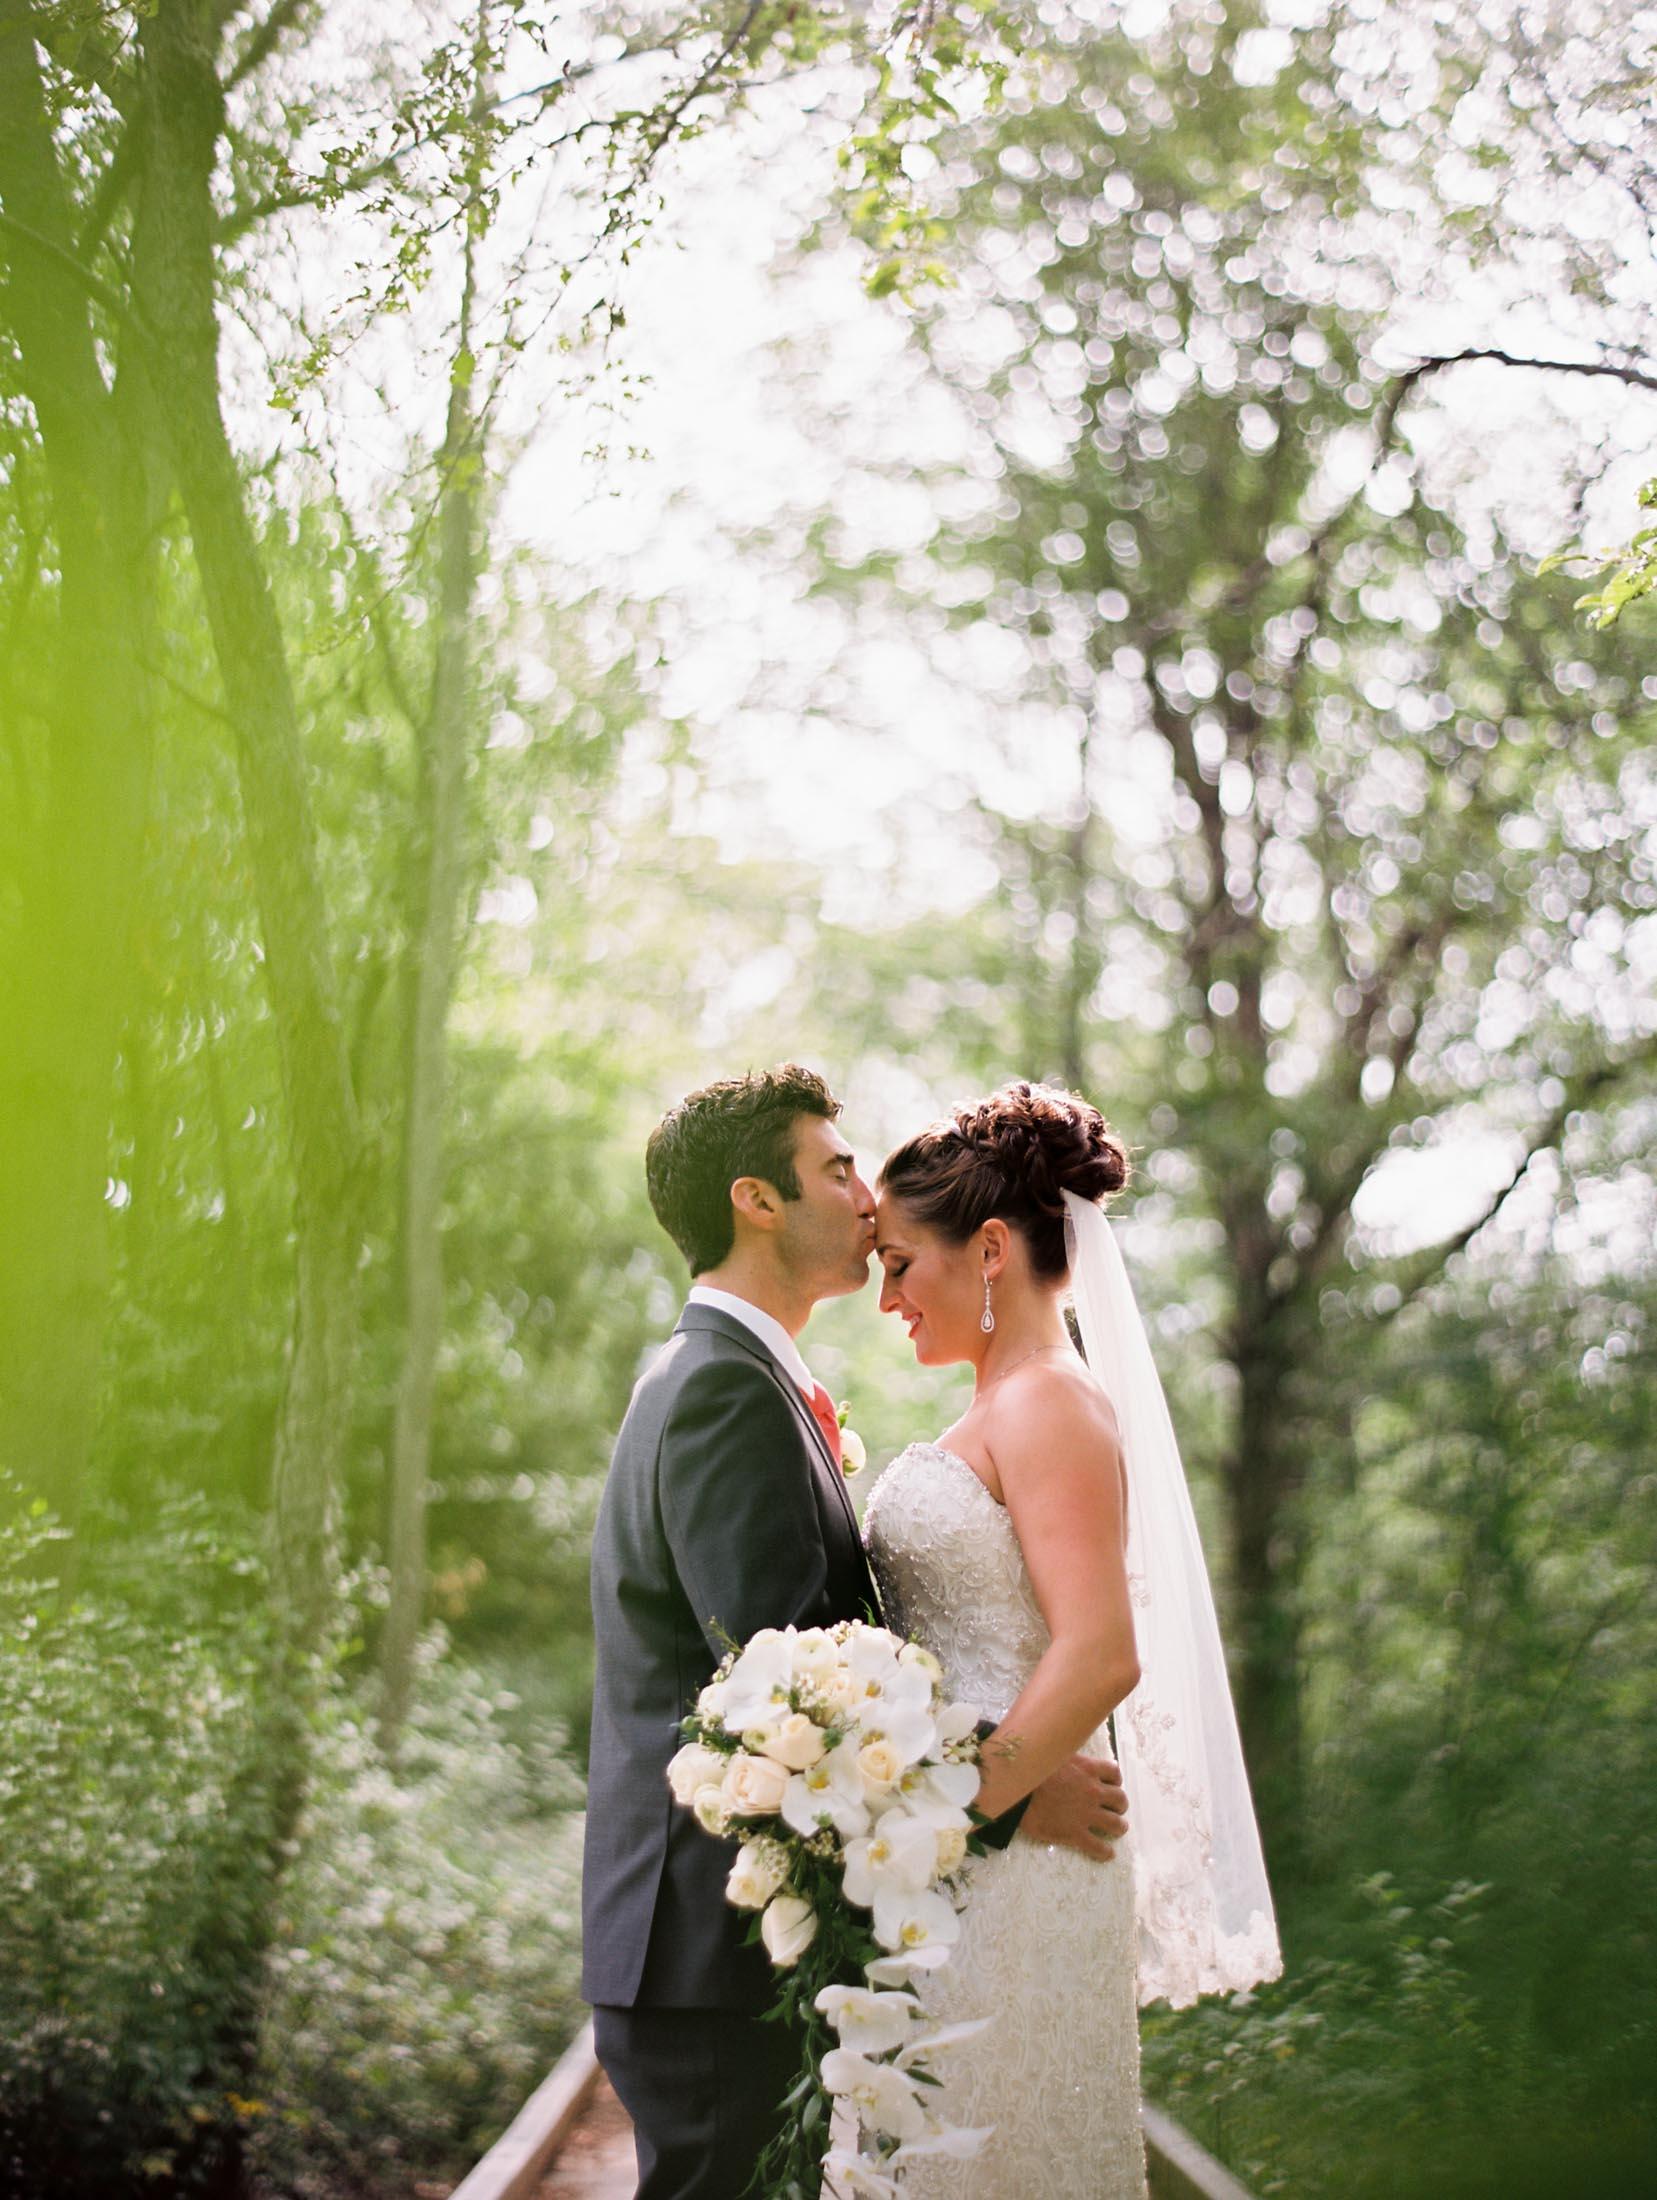 Willowdale-wedding-photography-46.jpg